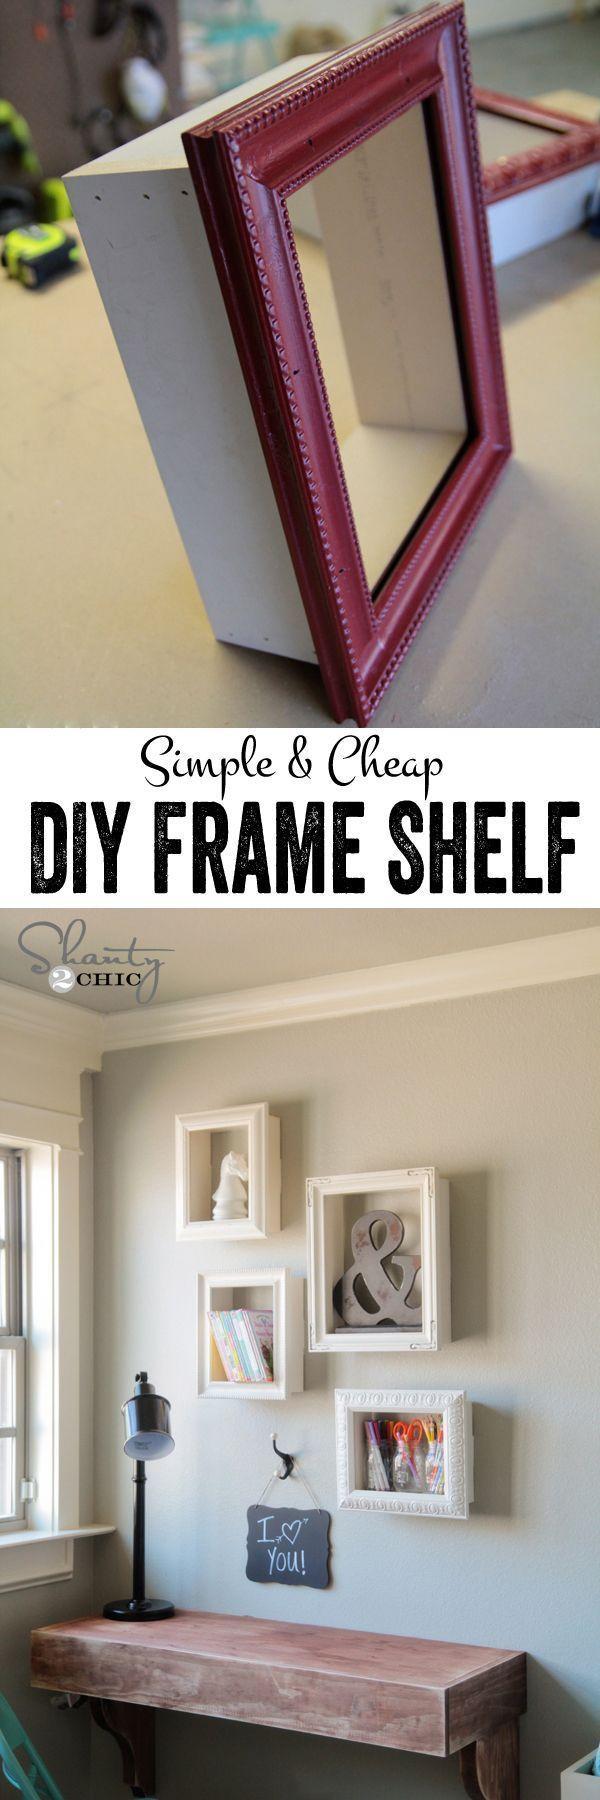 best easy home decor images on pinterest good ideas home ideas